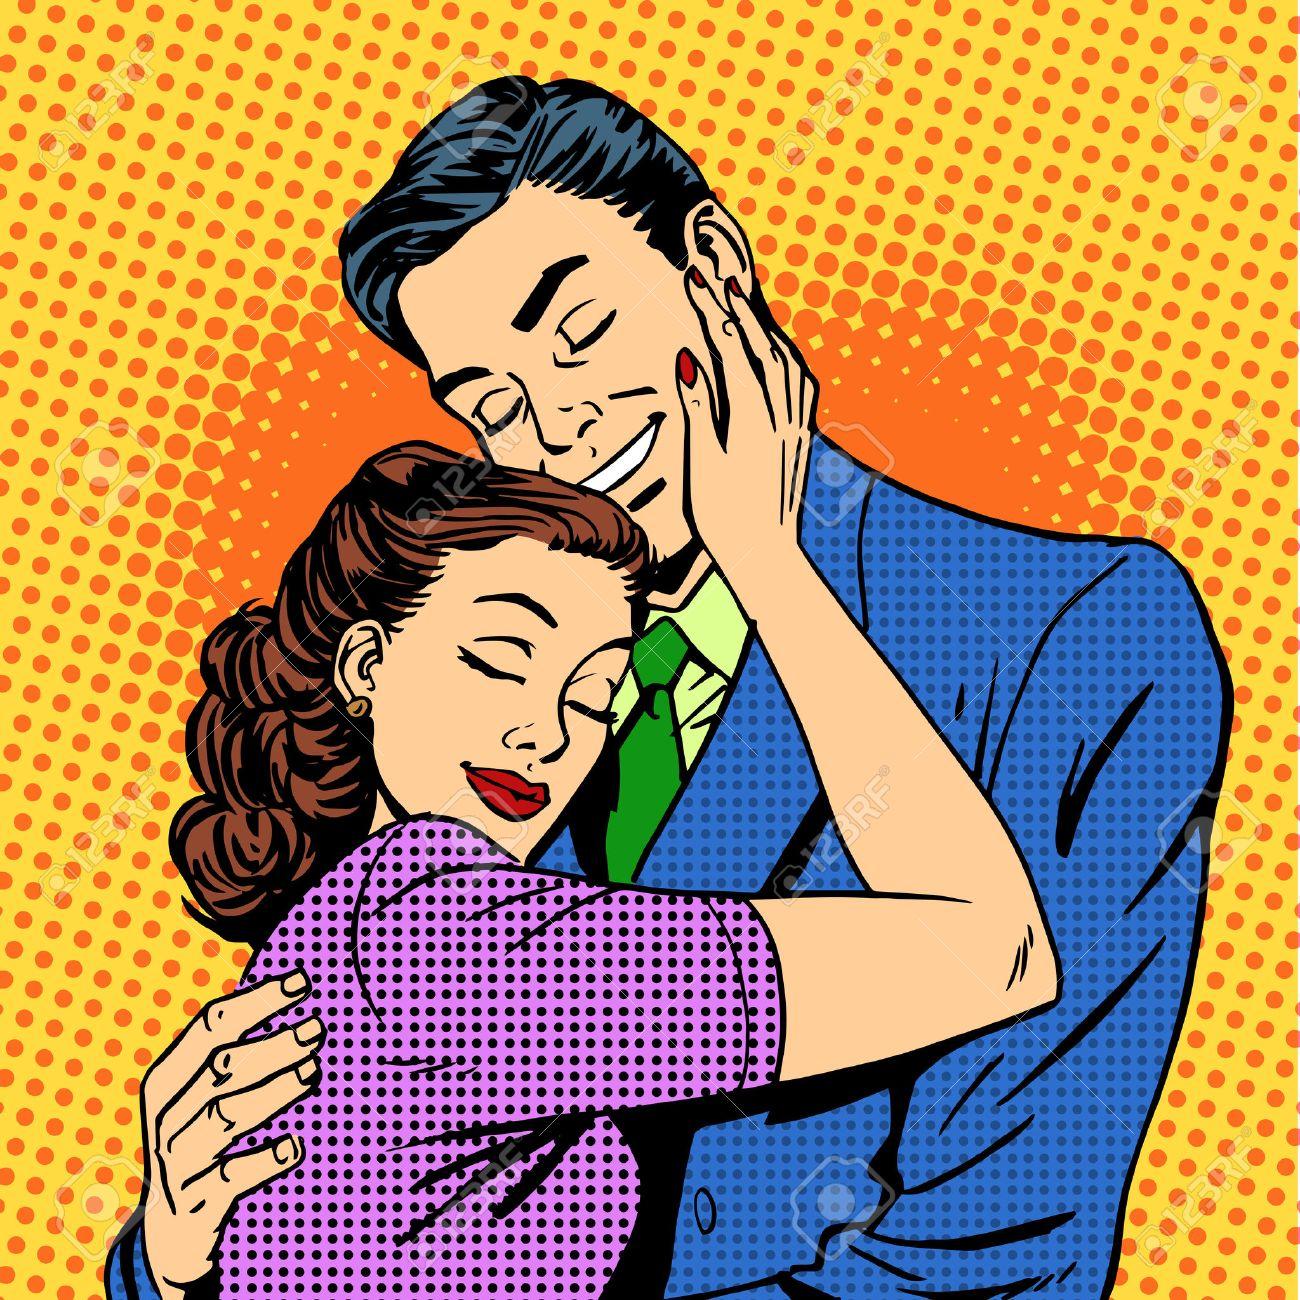 Couple in love hugging husband wife retro pop art love romance Stock Vector - 44649207